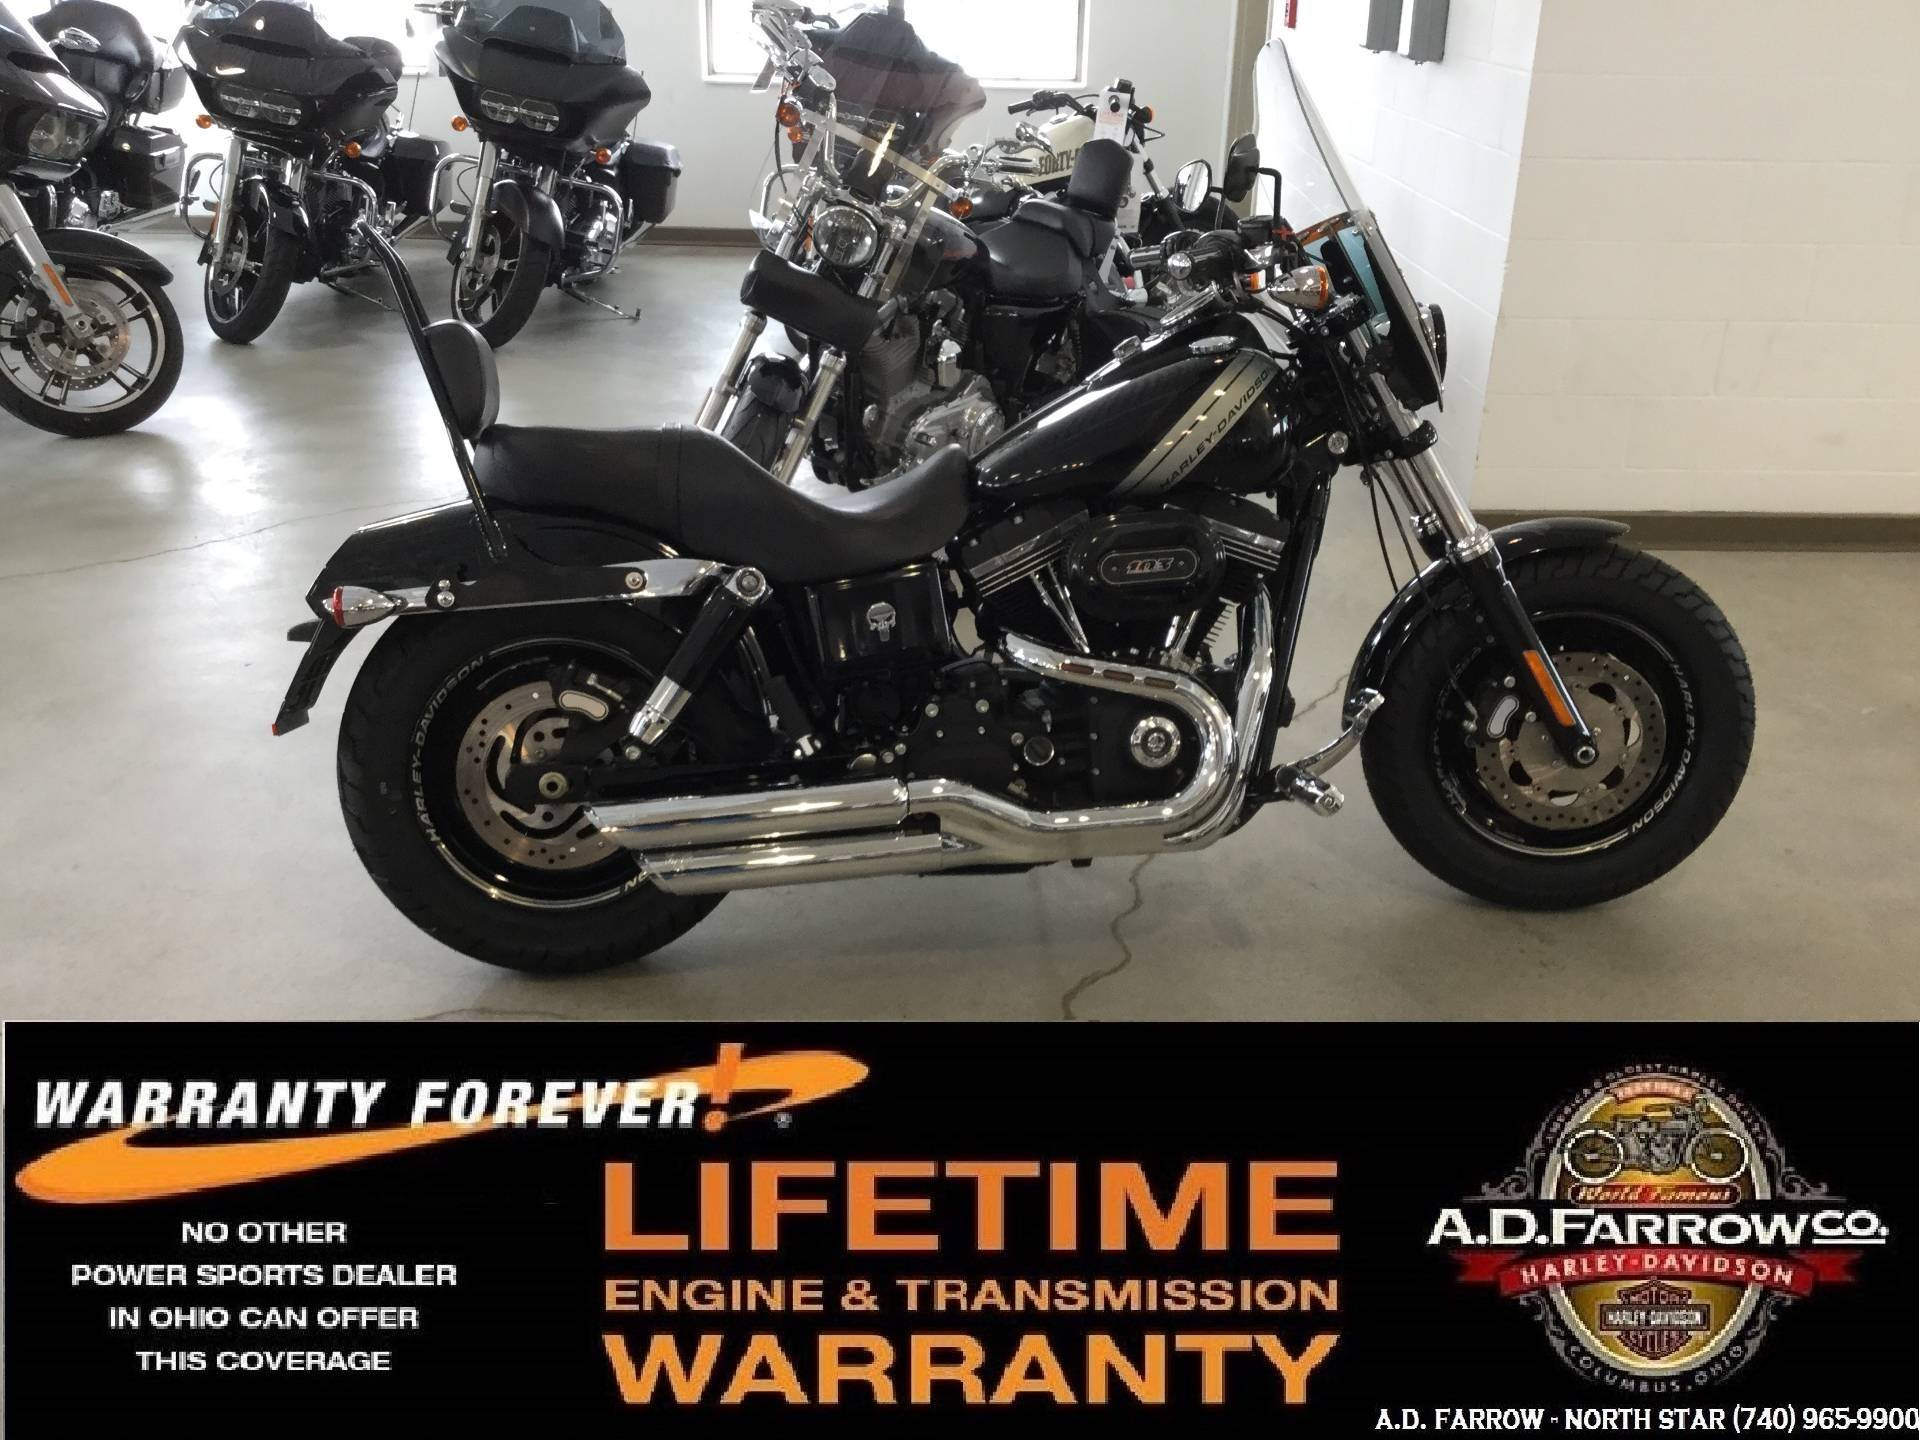 2016 Harley Davidson Fat Bob In Sunbury Ohio Photo 1